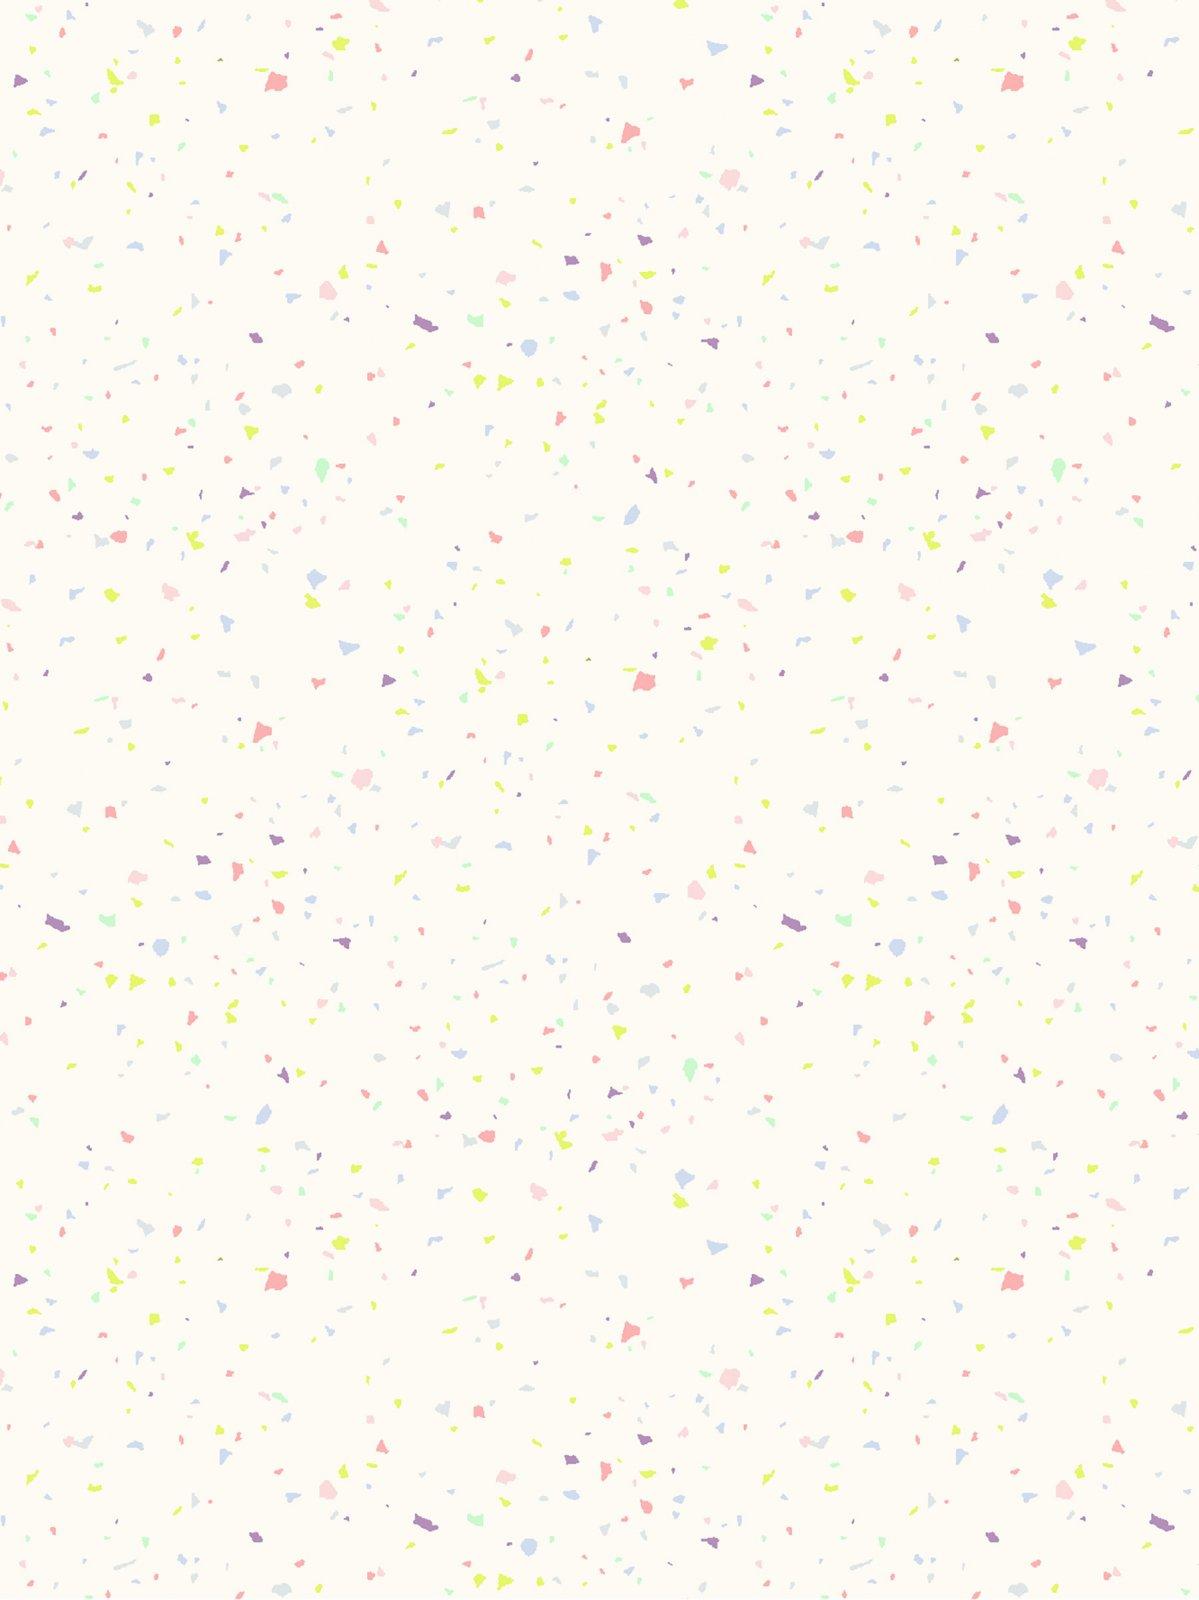 Confetti - Pastel on Cream Fabric